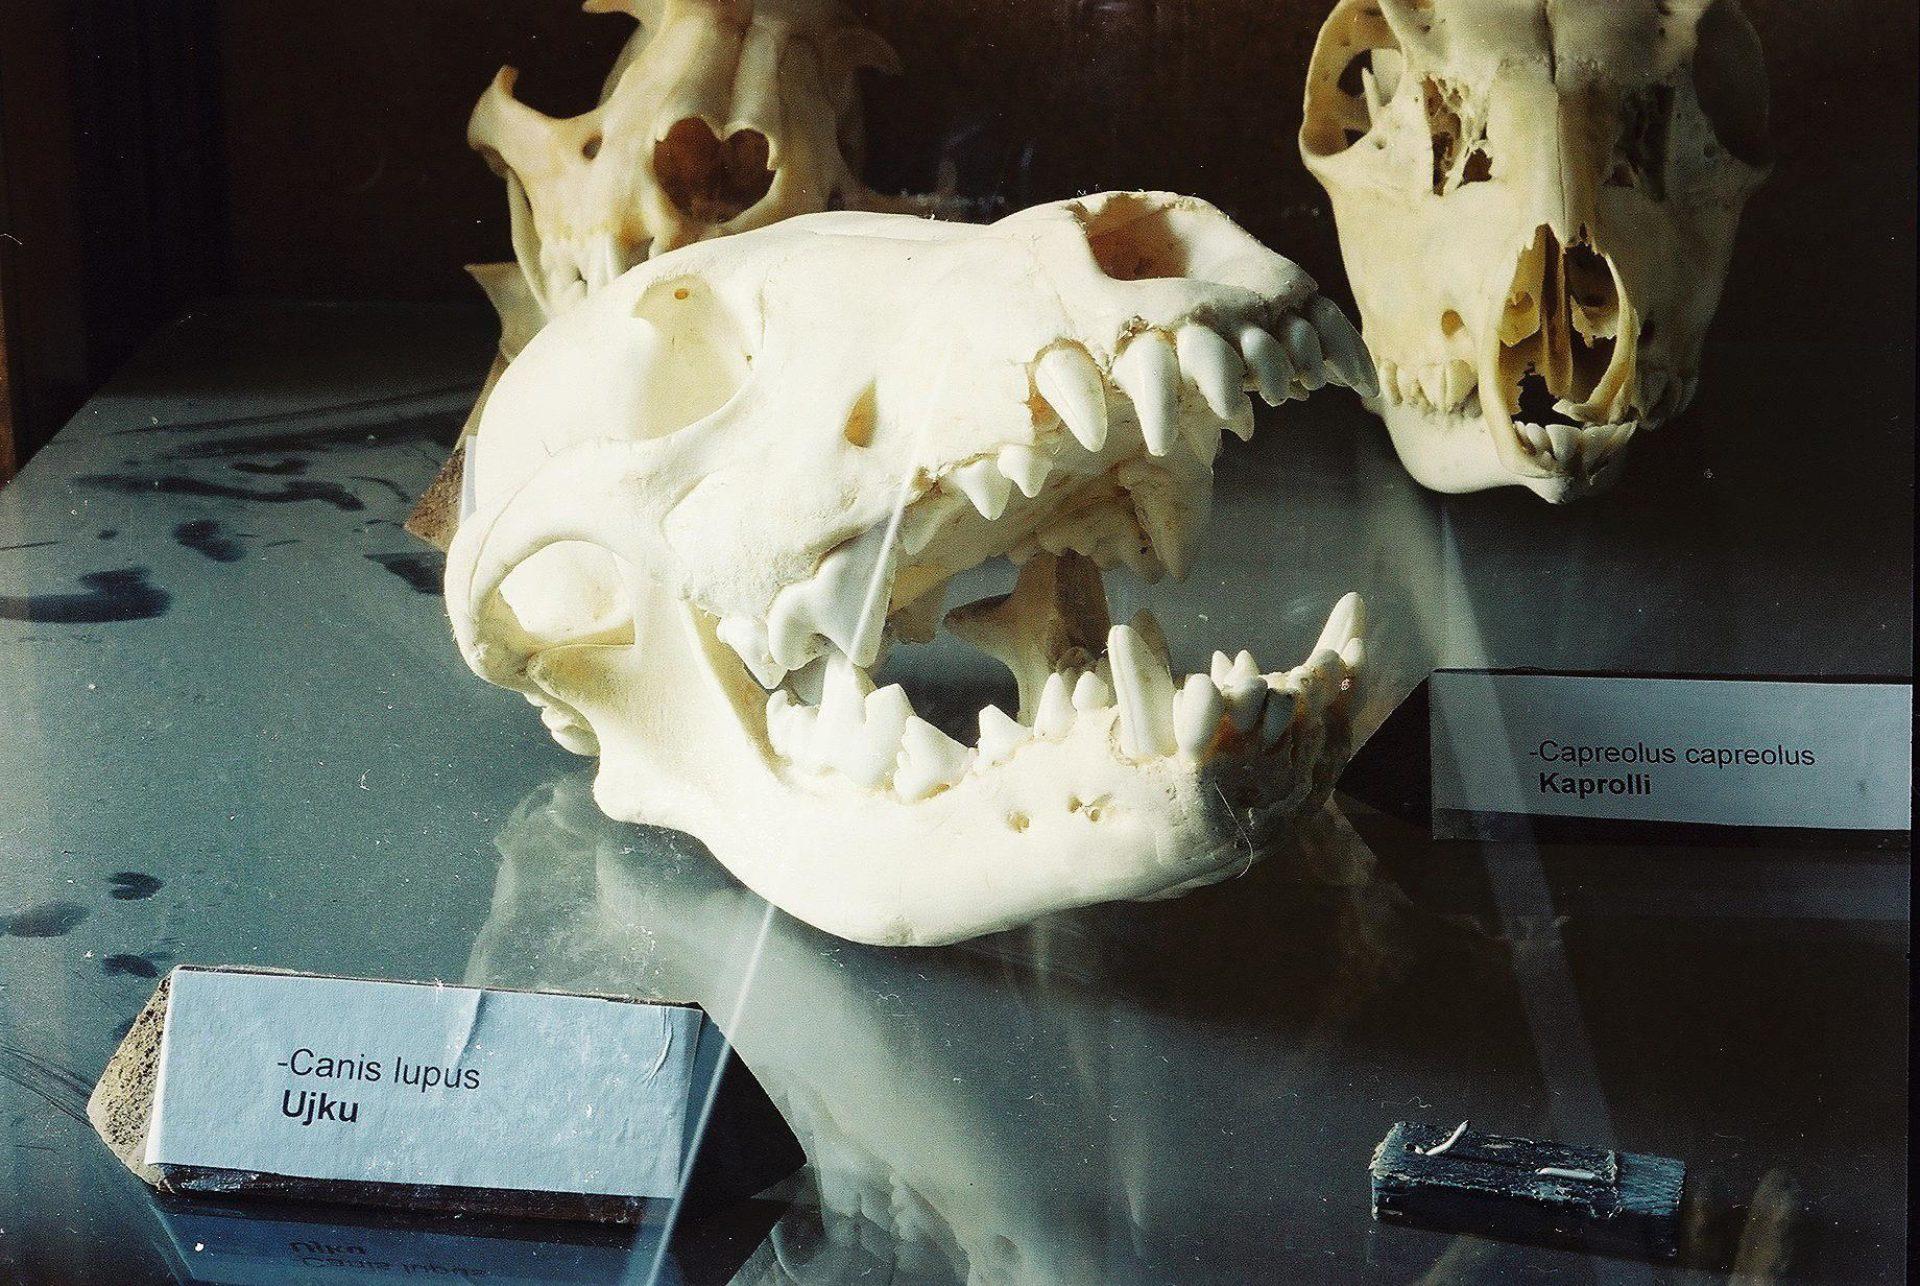 Petrit Halilaj, Special Edition (ex-Natural History Museum of Kosovo), 2013 (15/80)